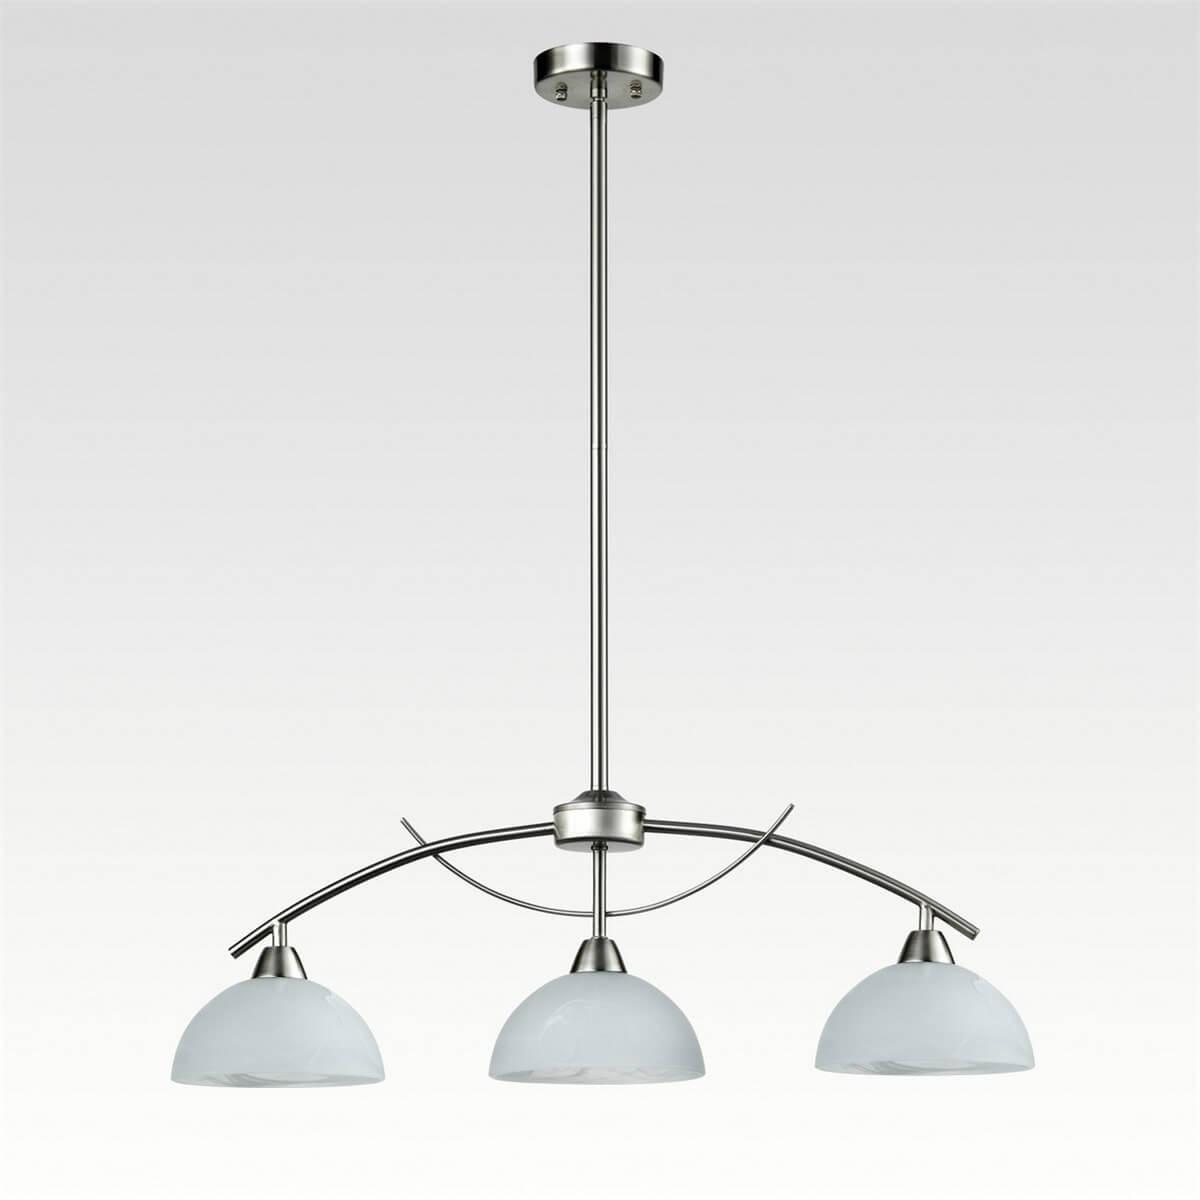 Modern 3-Light Kitchen Pendant Lighting, Brushed Nickel